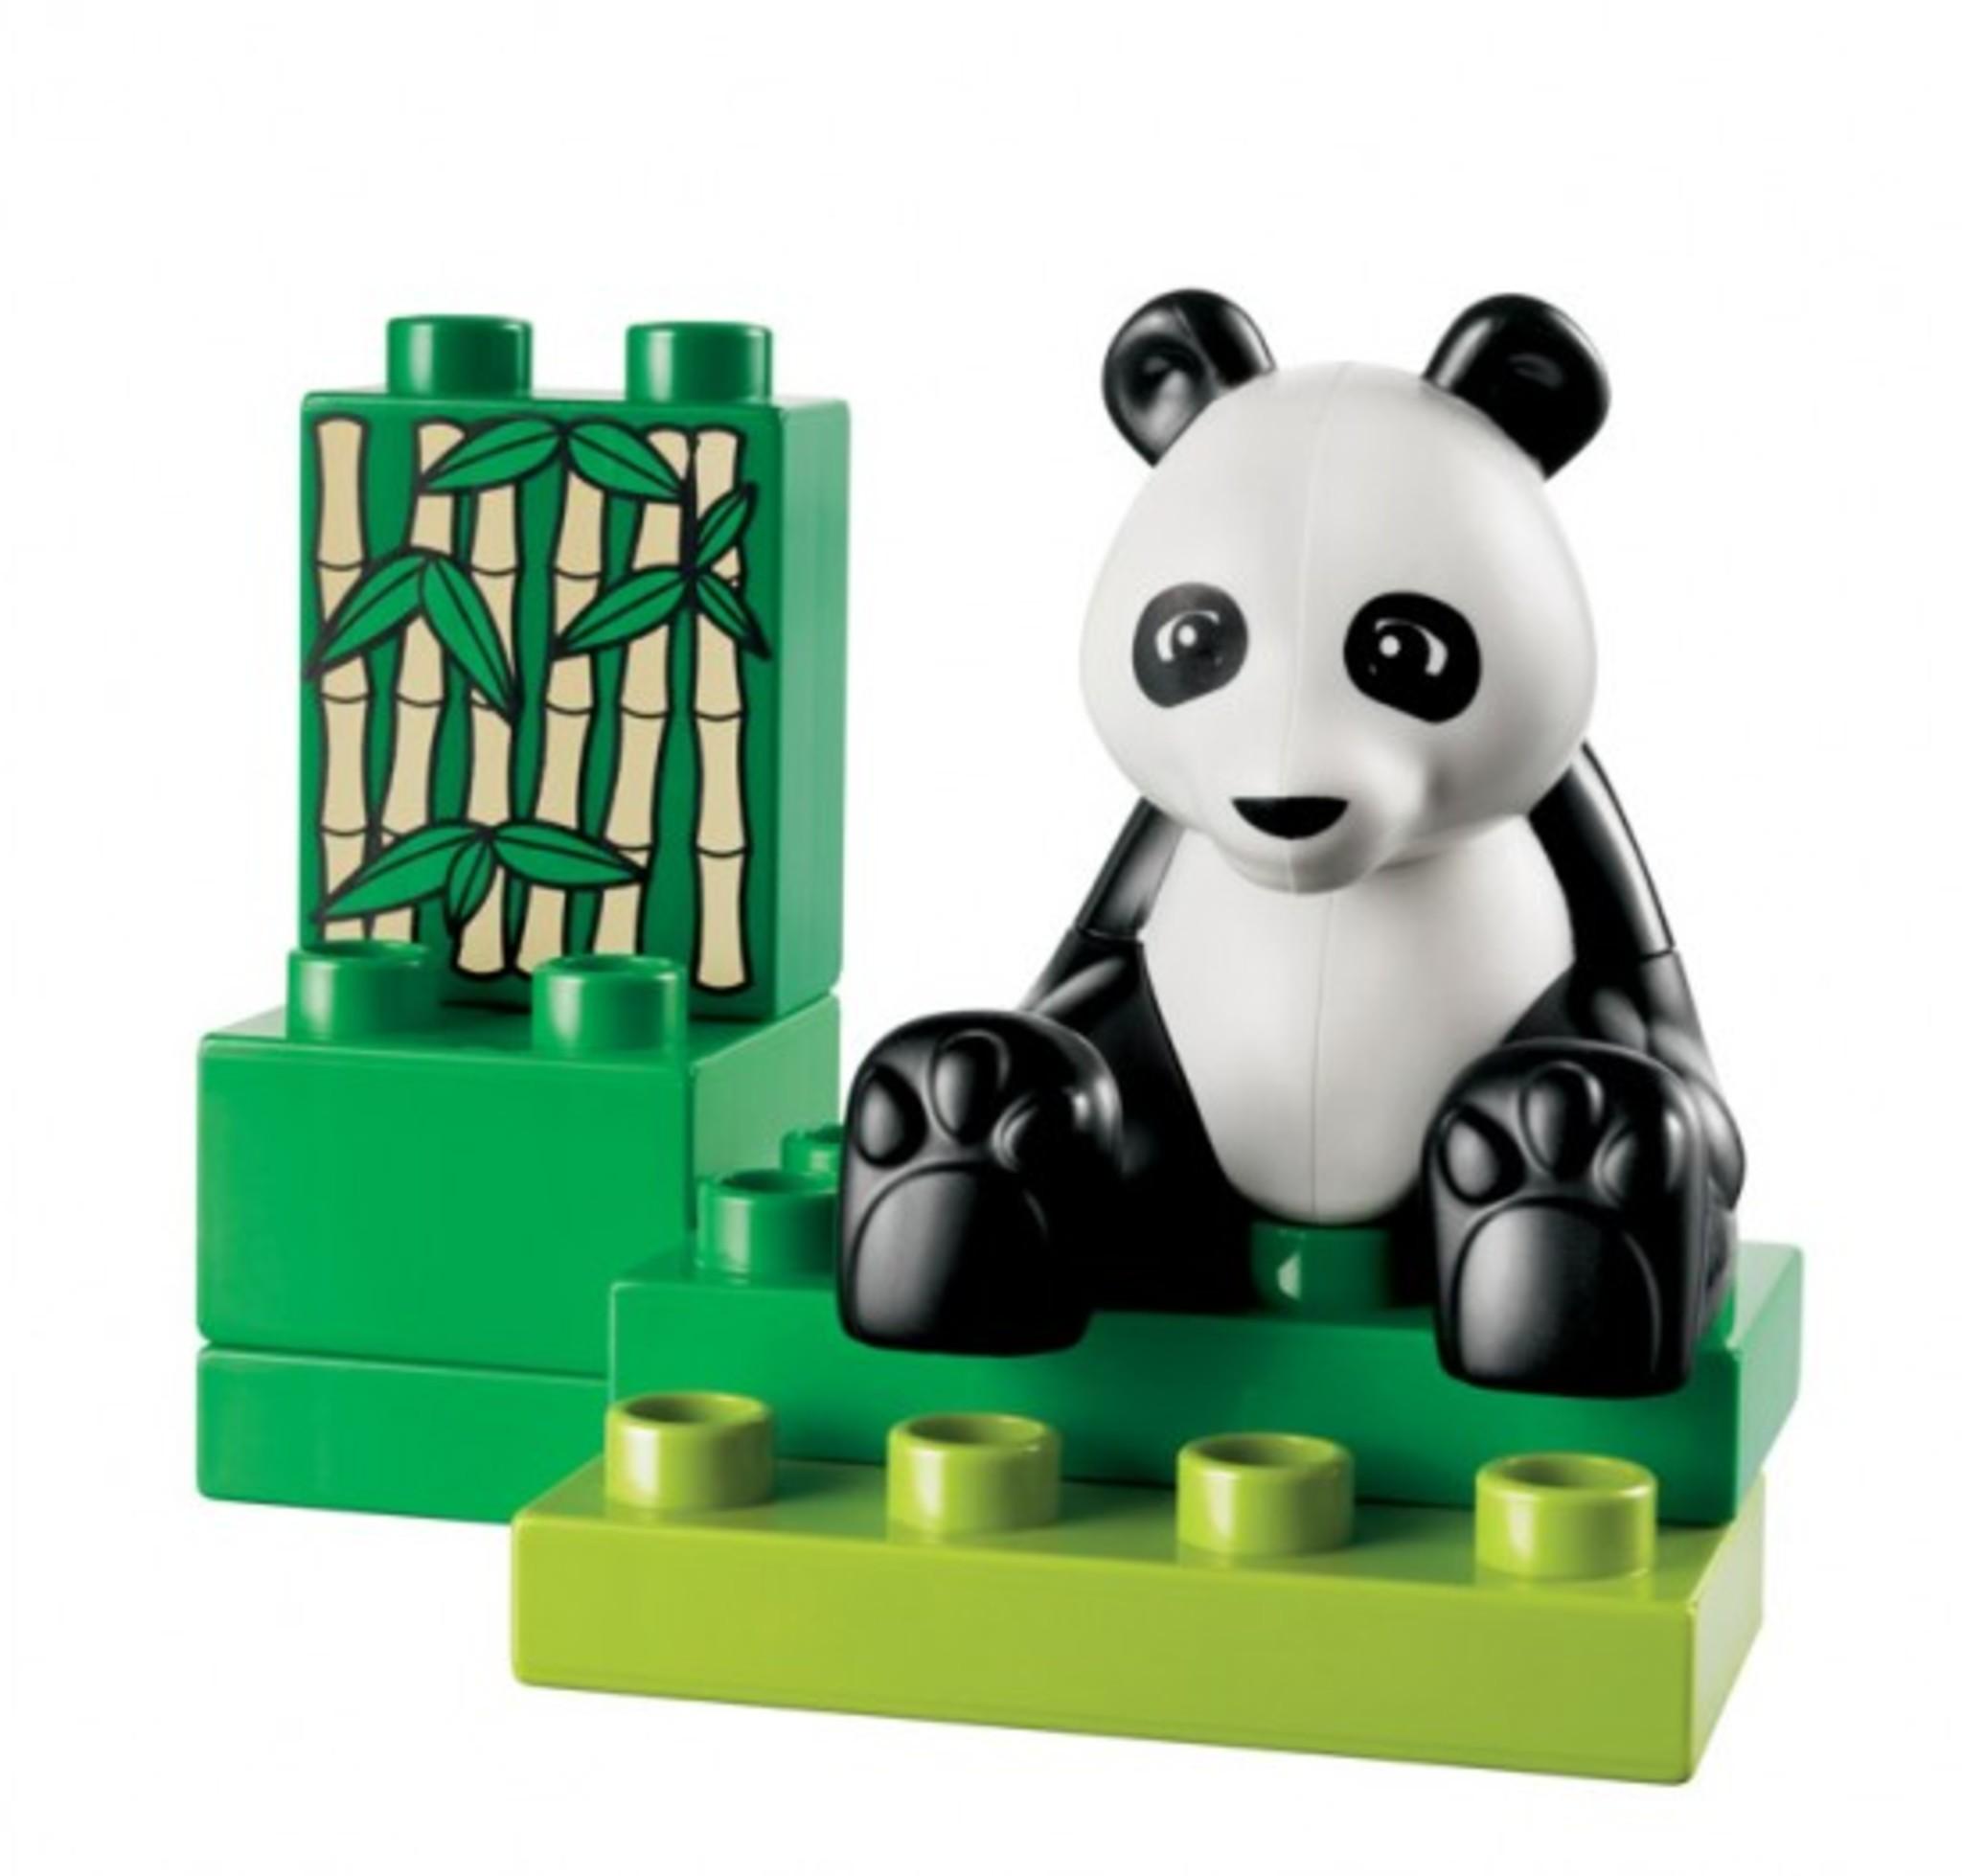 LEGO Education 9218 - Wild Animals Set | Mattonito